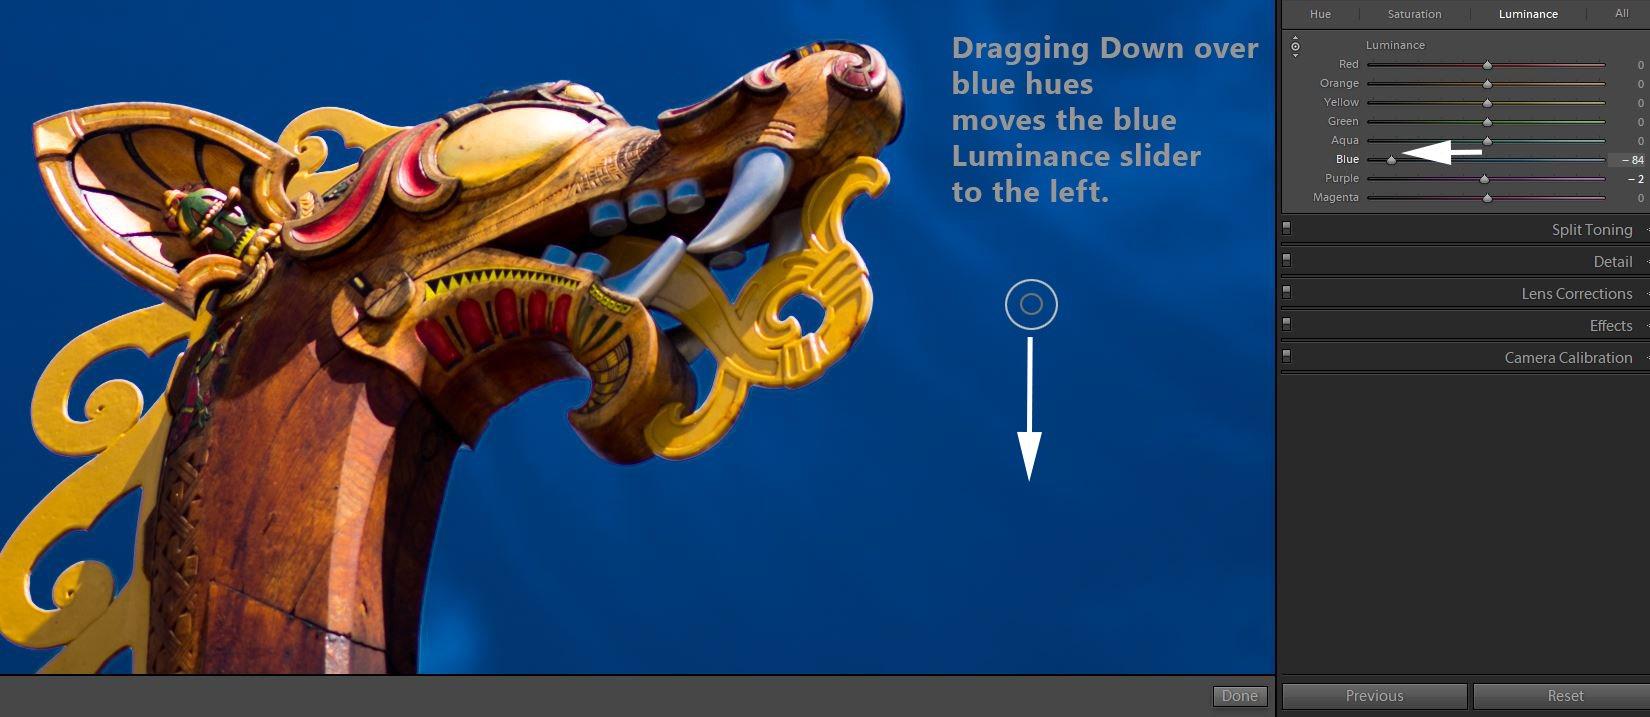 Blue Luminance Change Dragon Jimagesdotcom